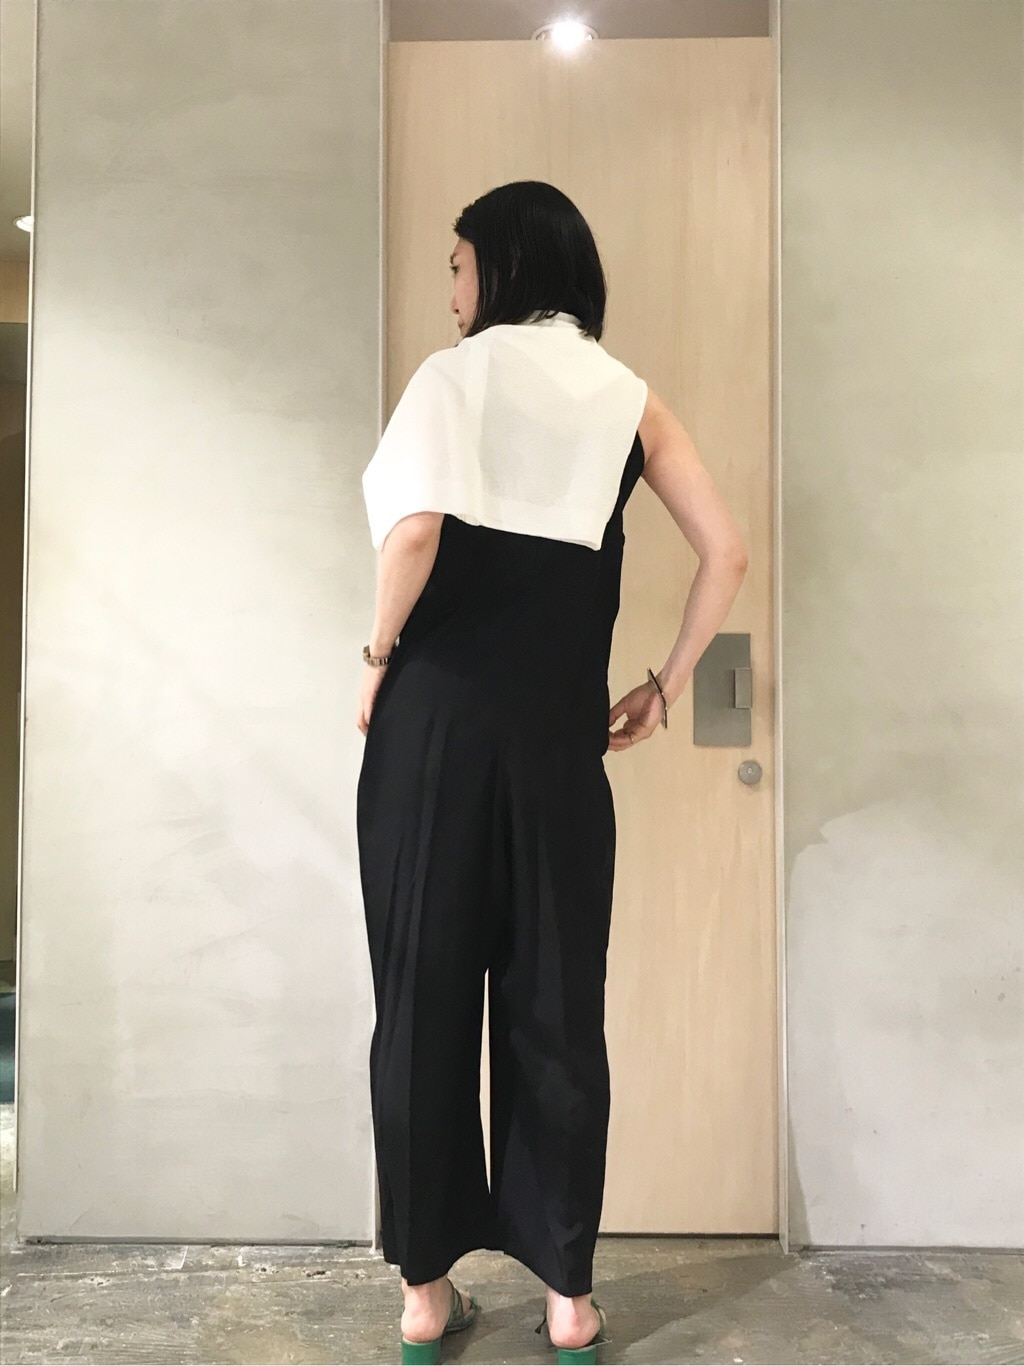 note et silence. ルミネ新宿 身長:169cm 2020.06.22